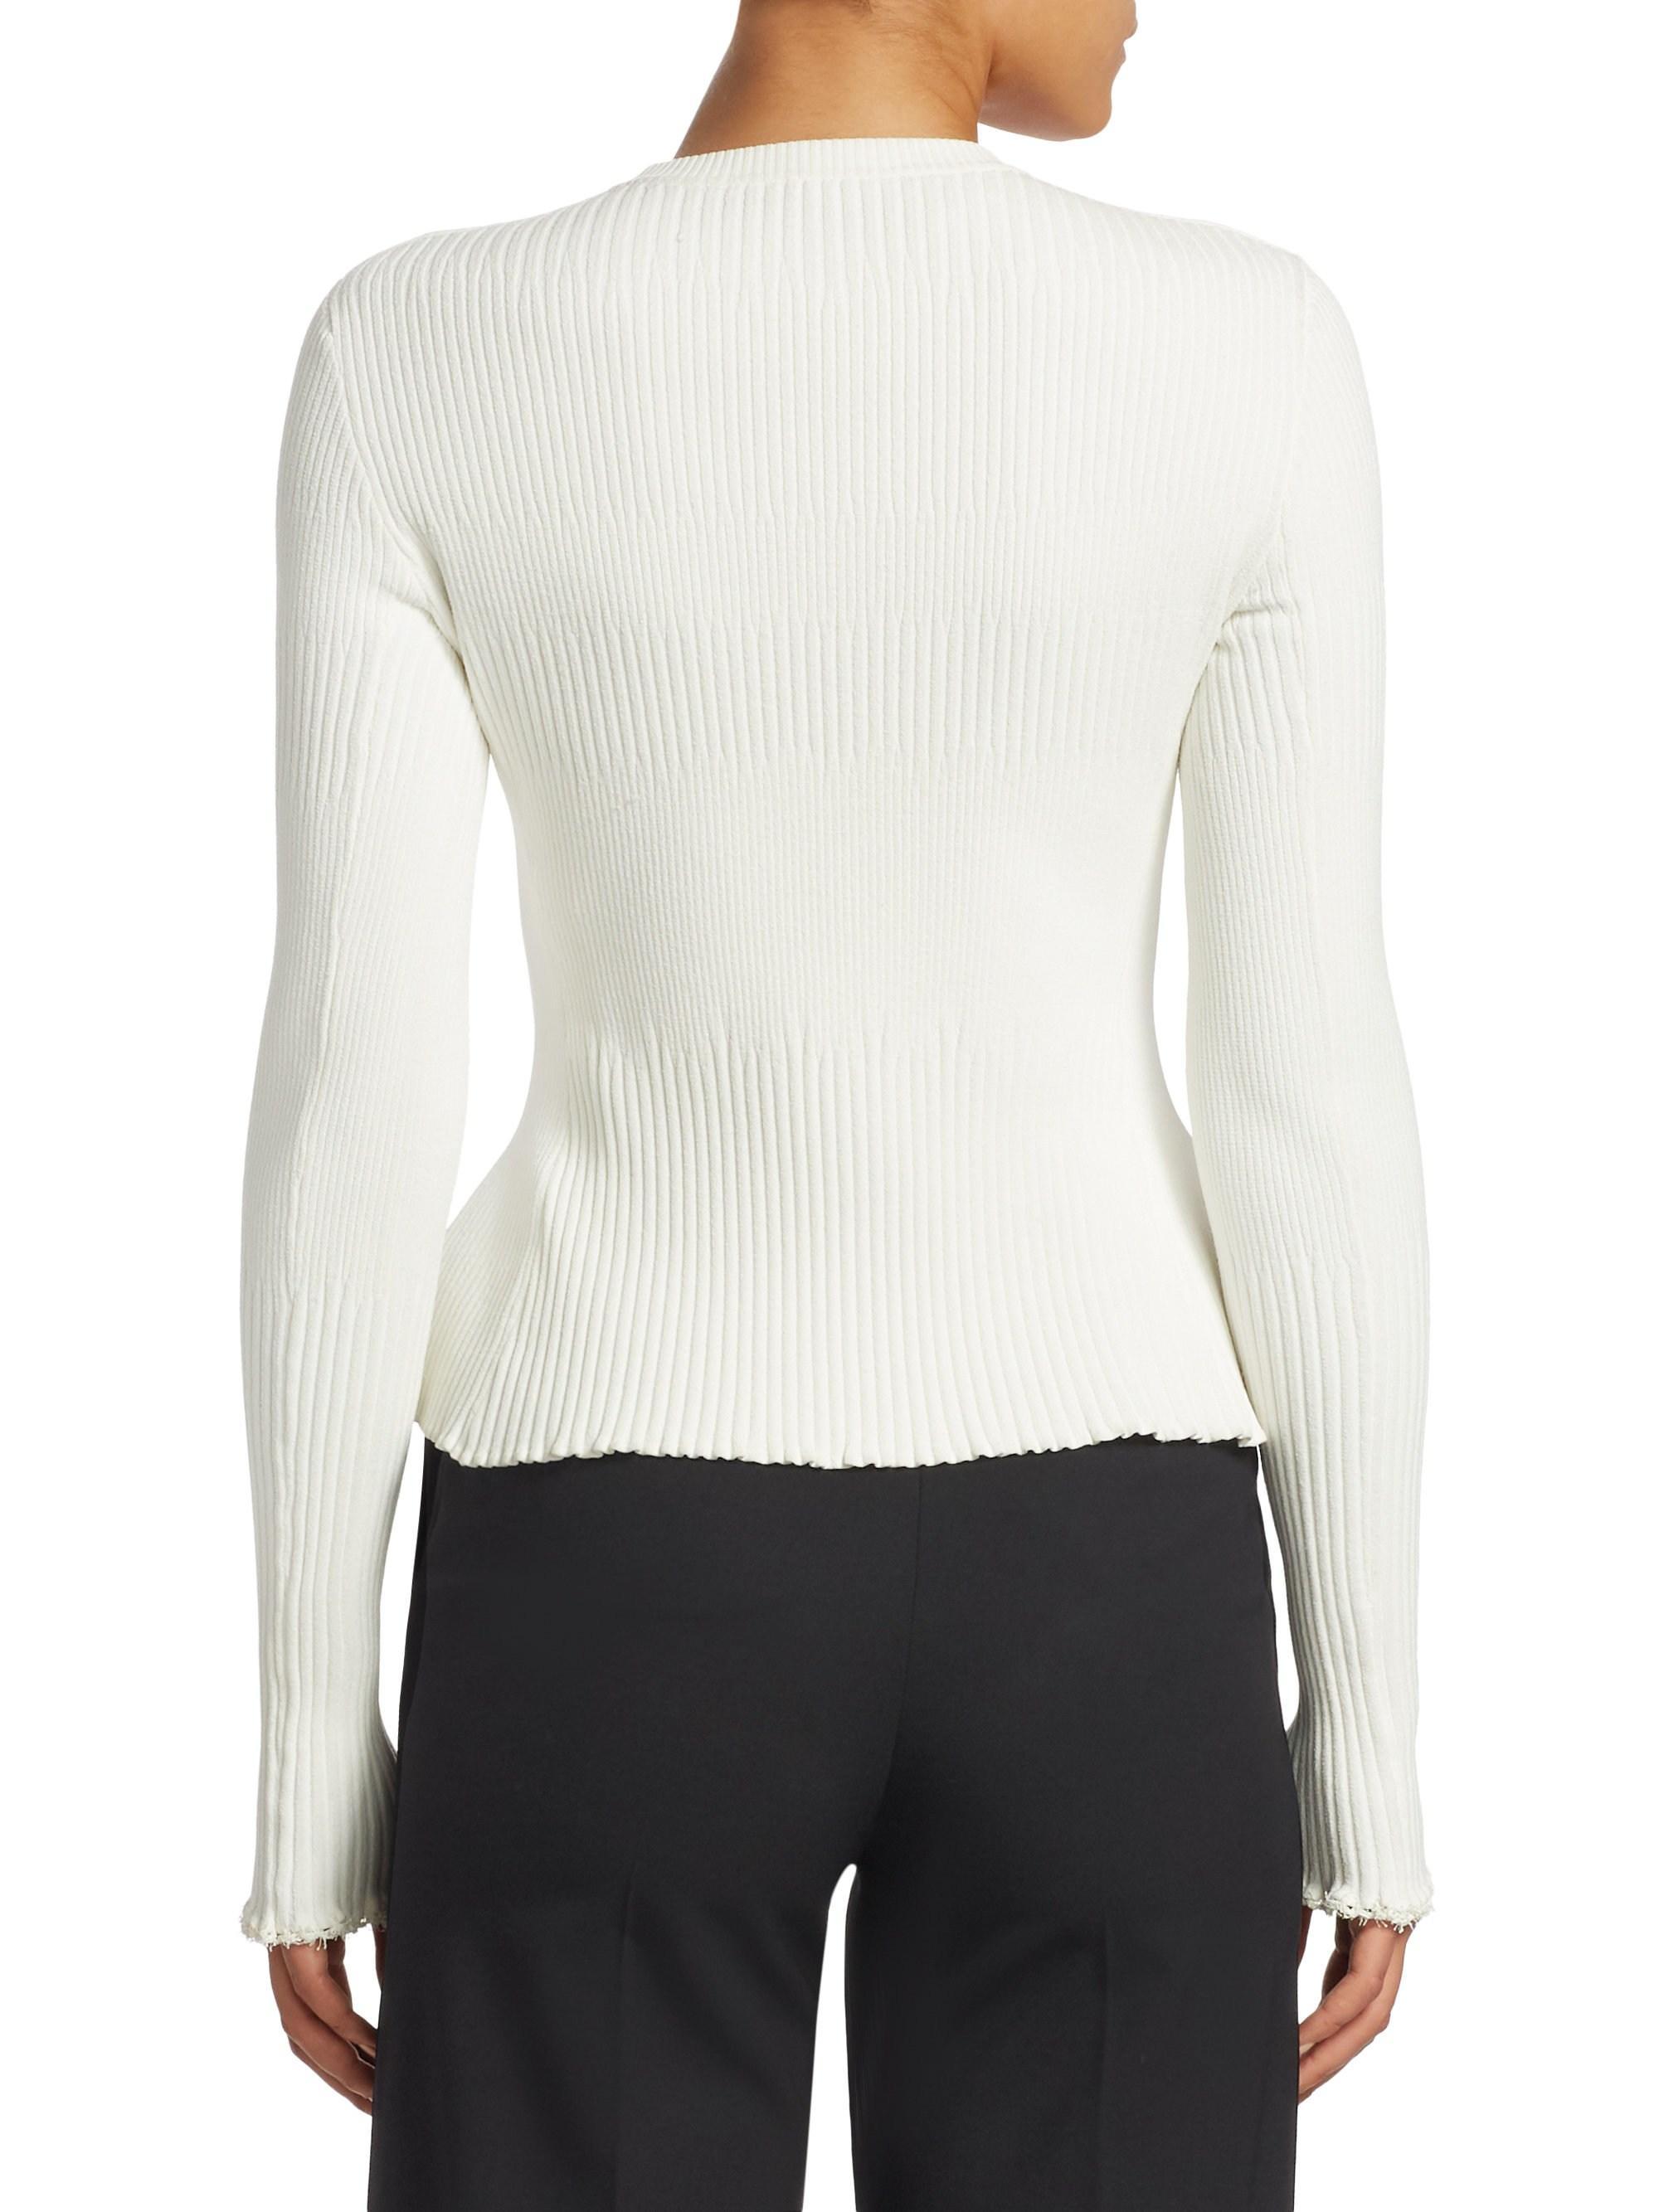 4333b17301de Lyst - Proenza Schouler Knit Peplum Cardigan in White